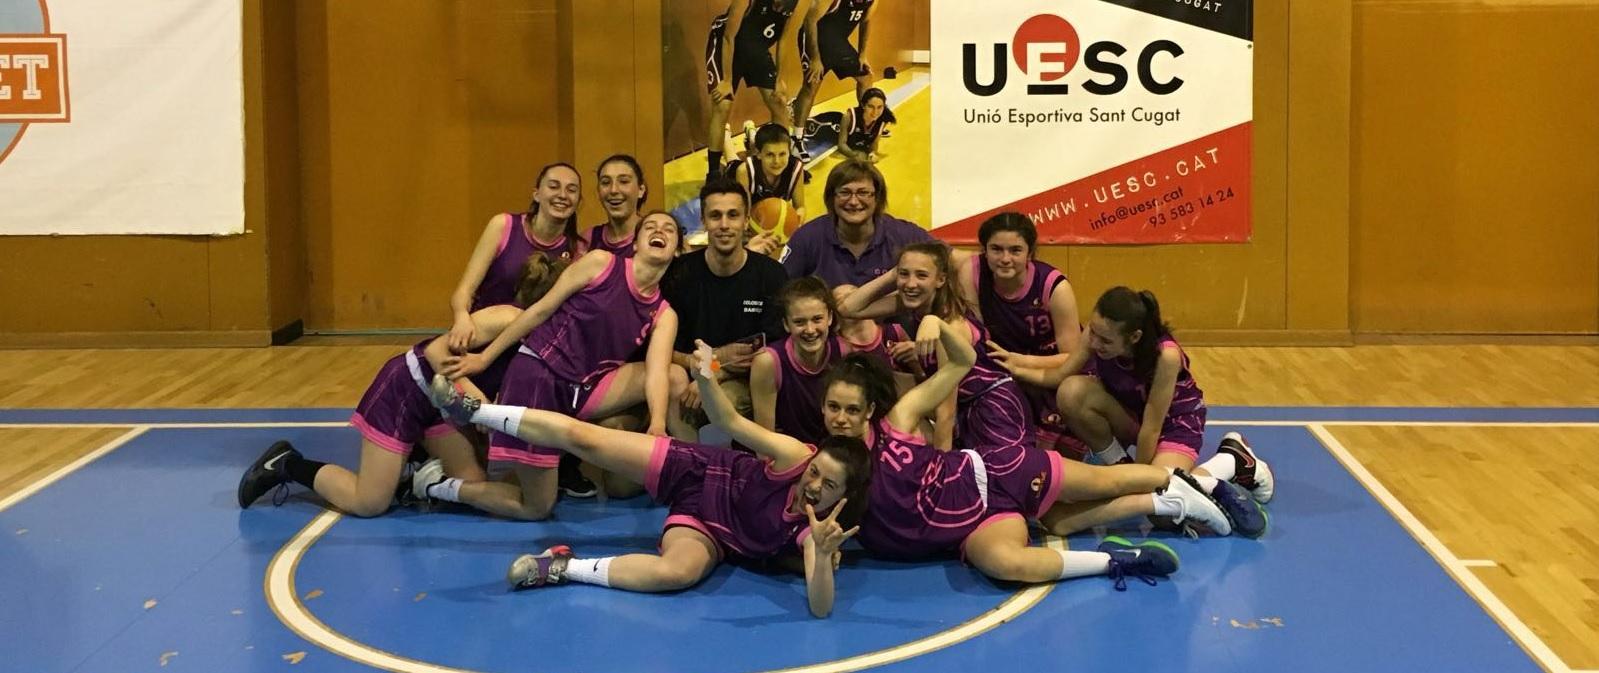 Colomiers Basket campiones Triangular Internacional OFFICE24